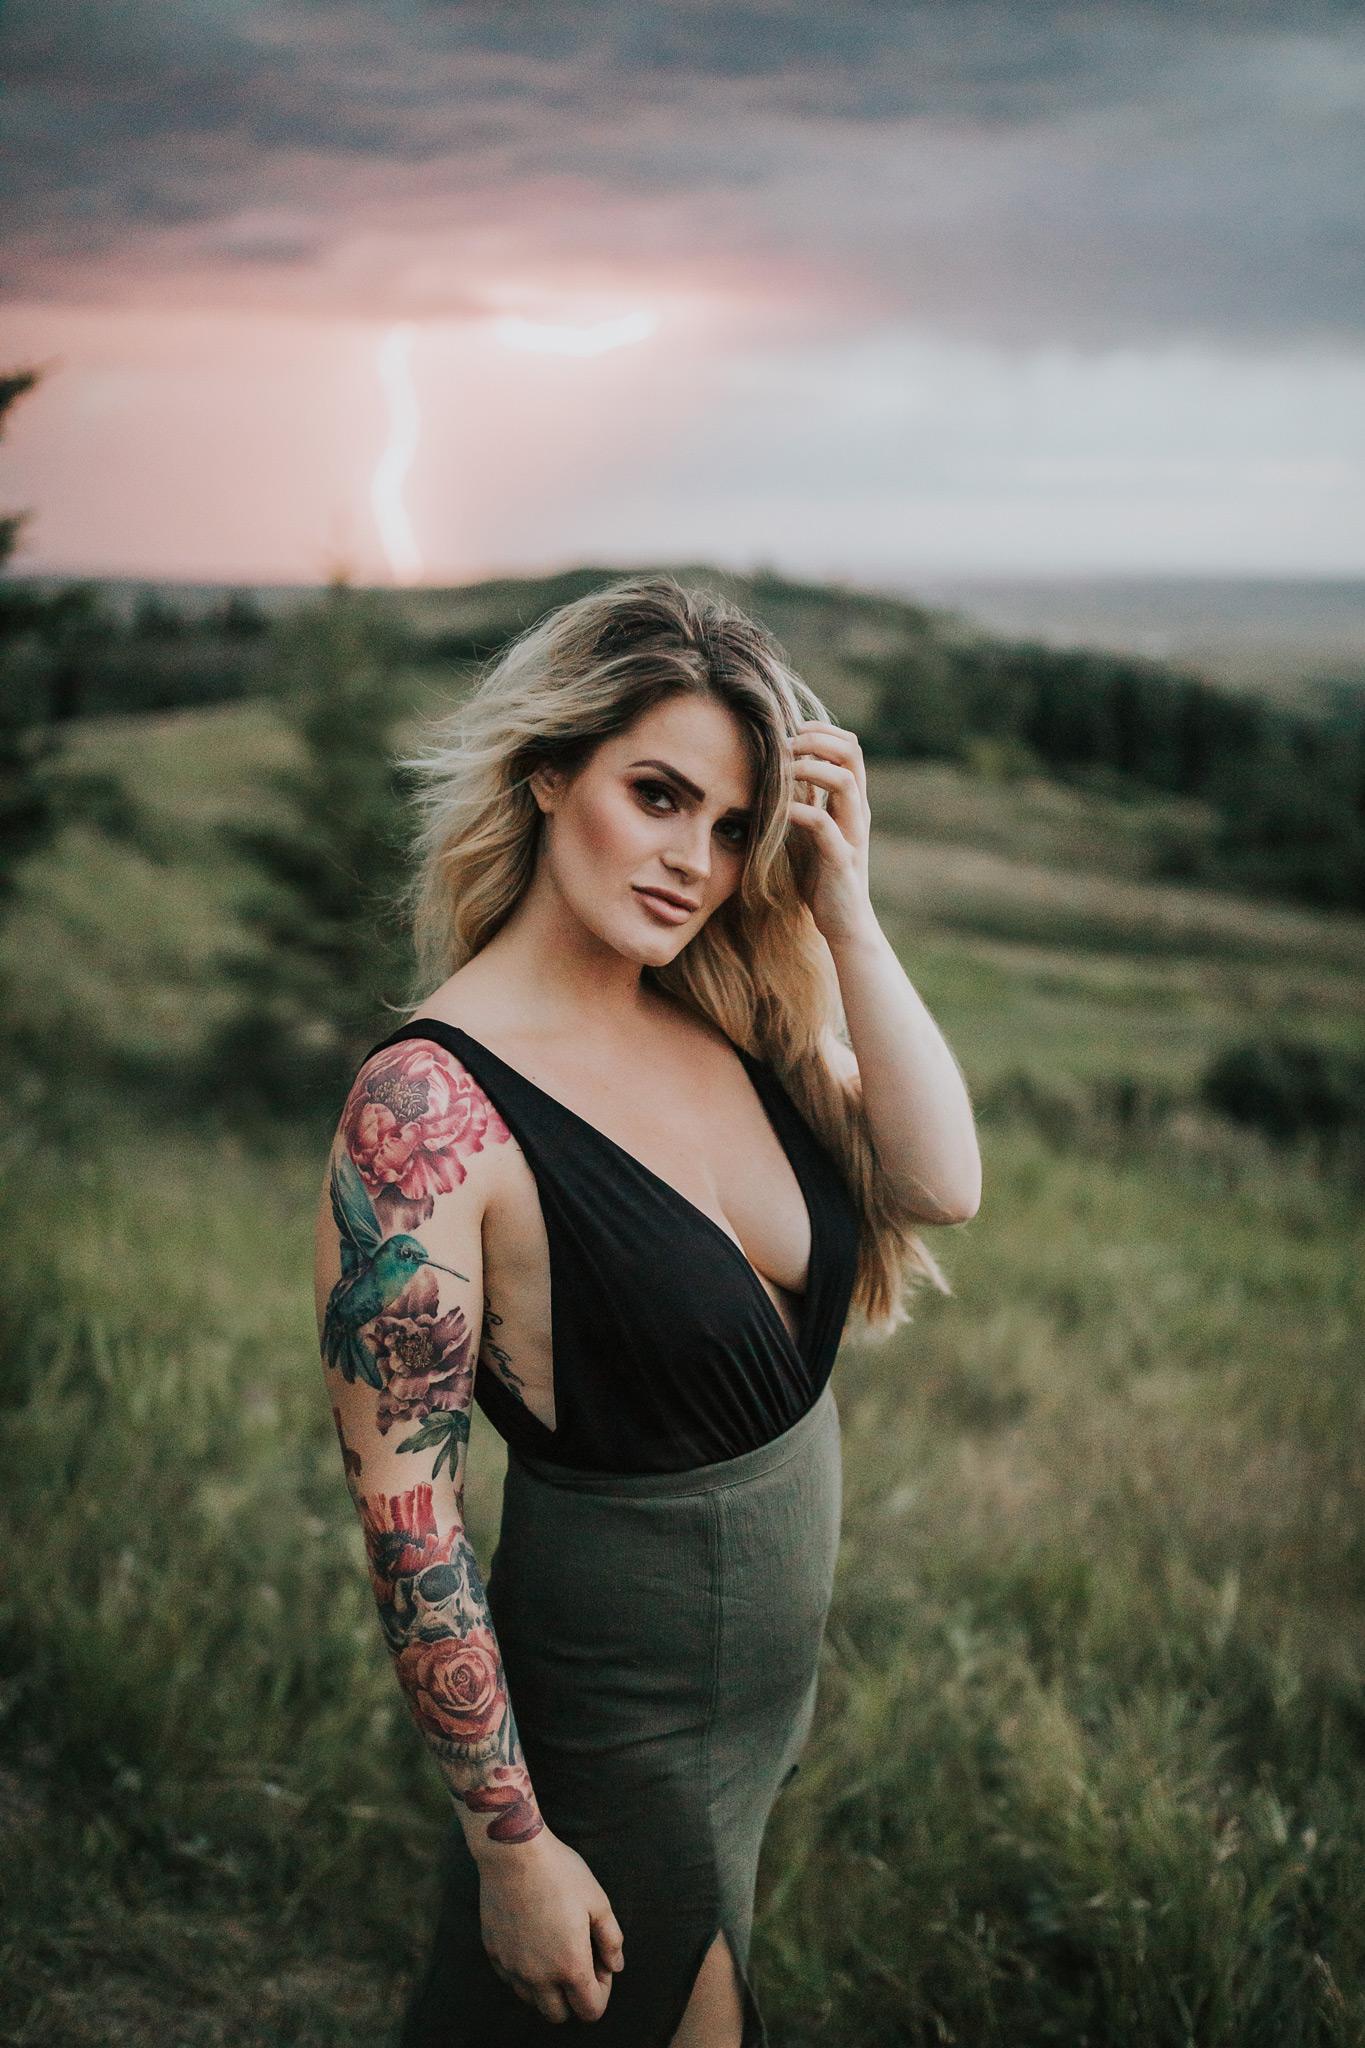 woman standing in front of lightning strike stormy reesor lake portrait boudoir